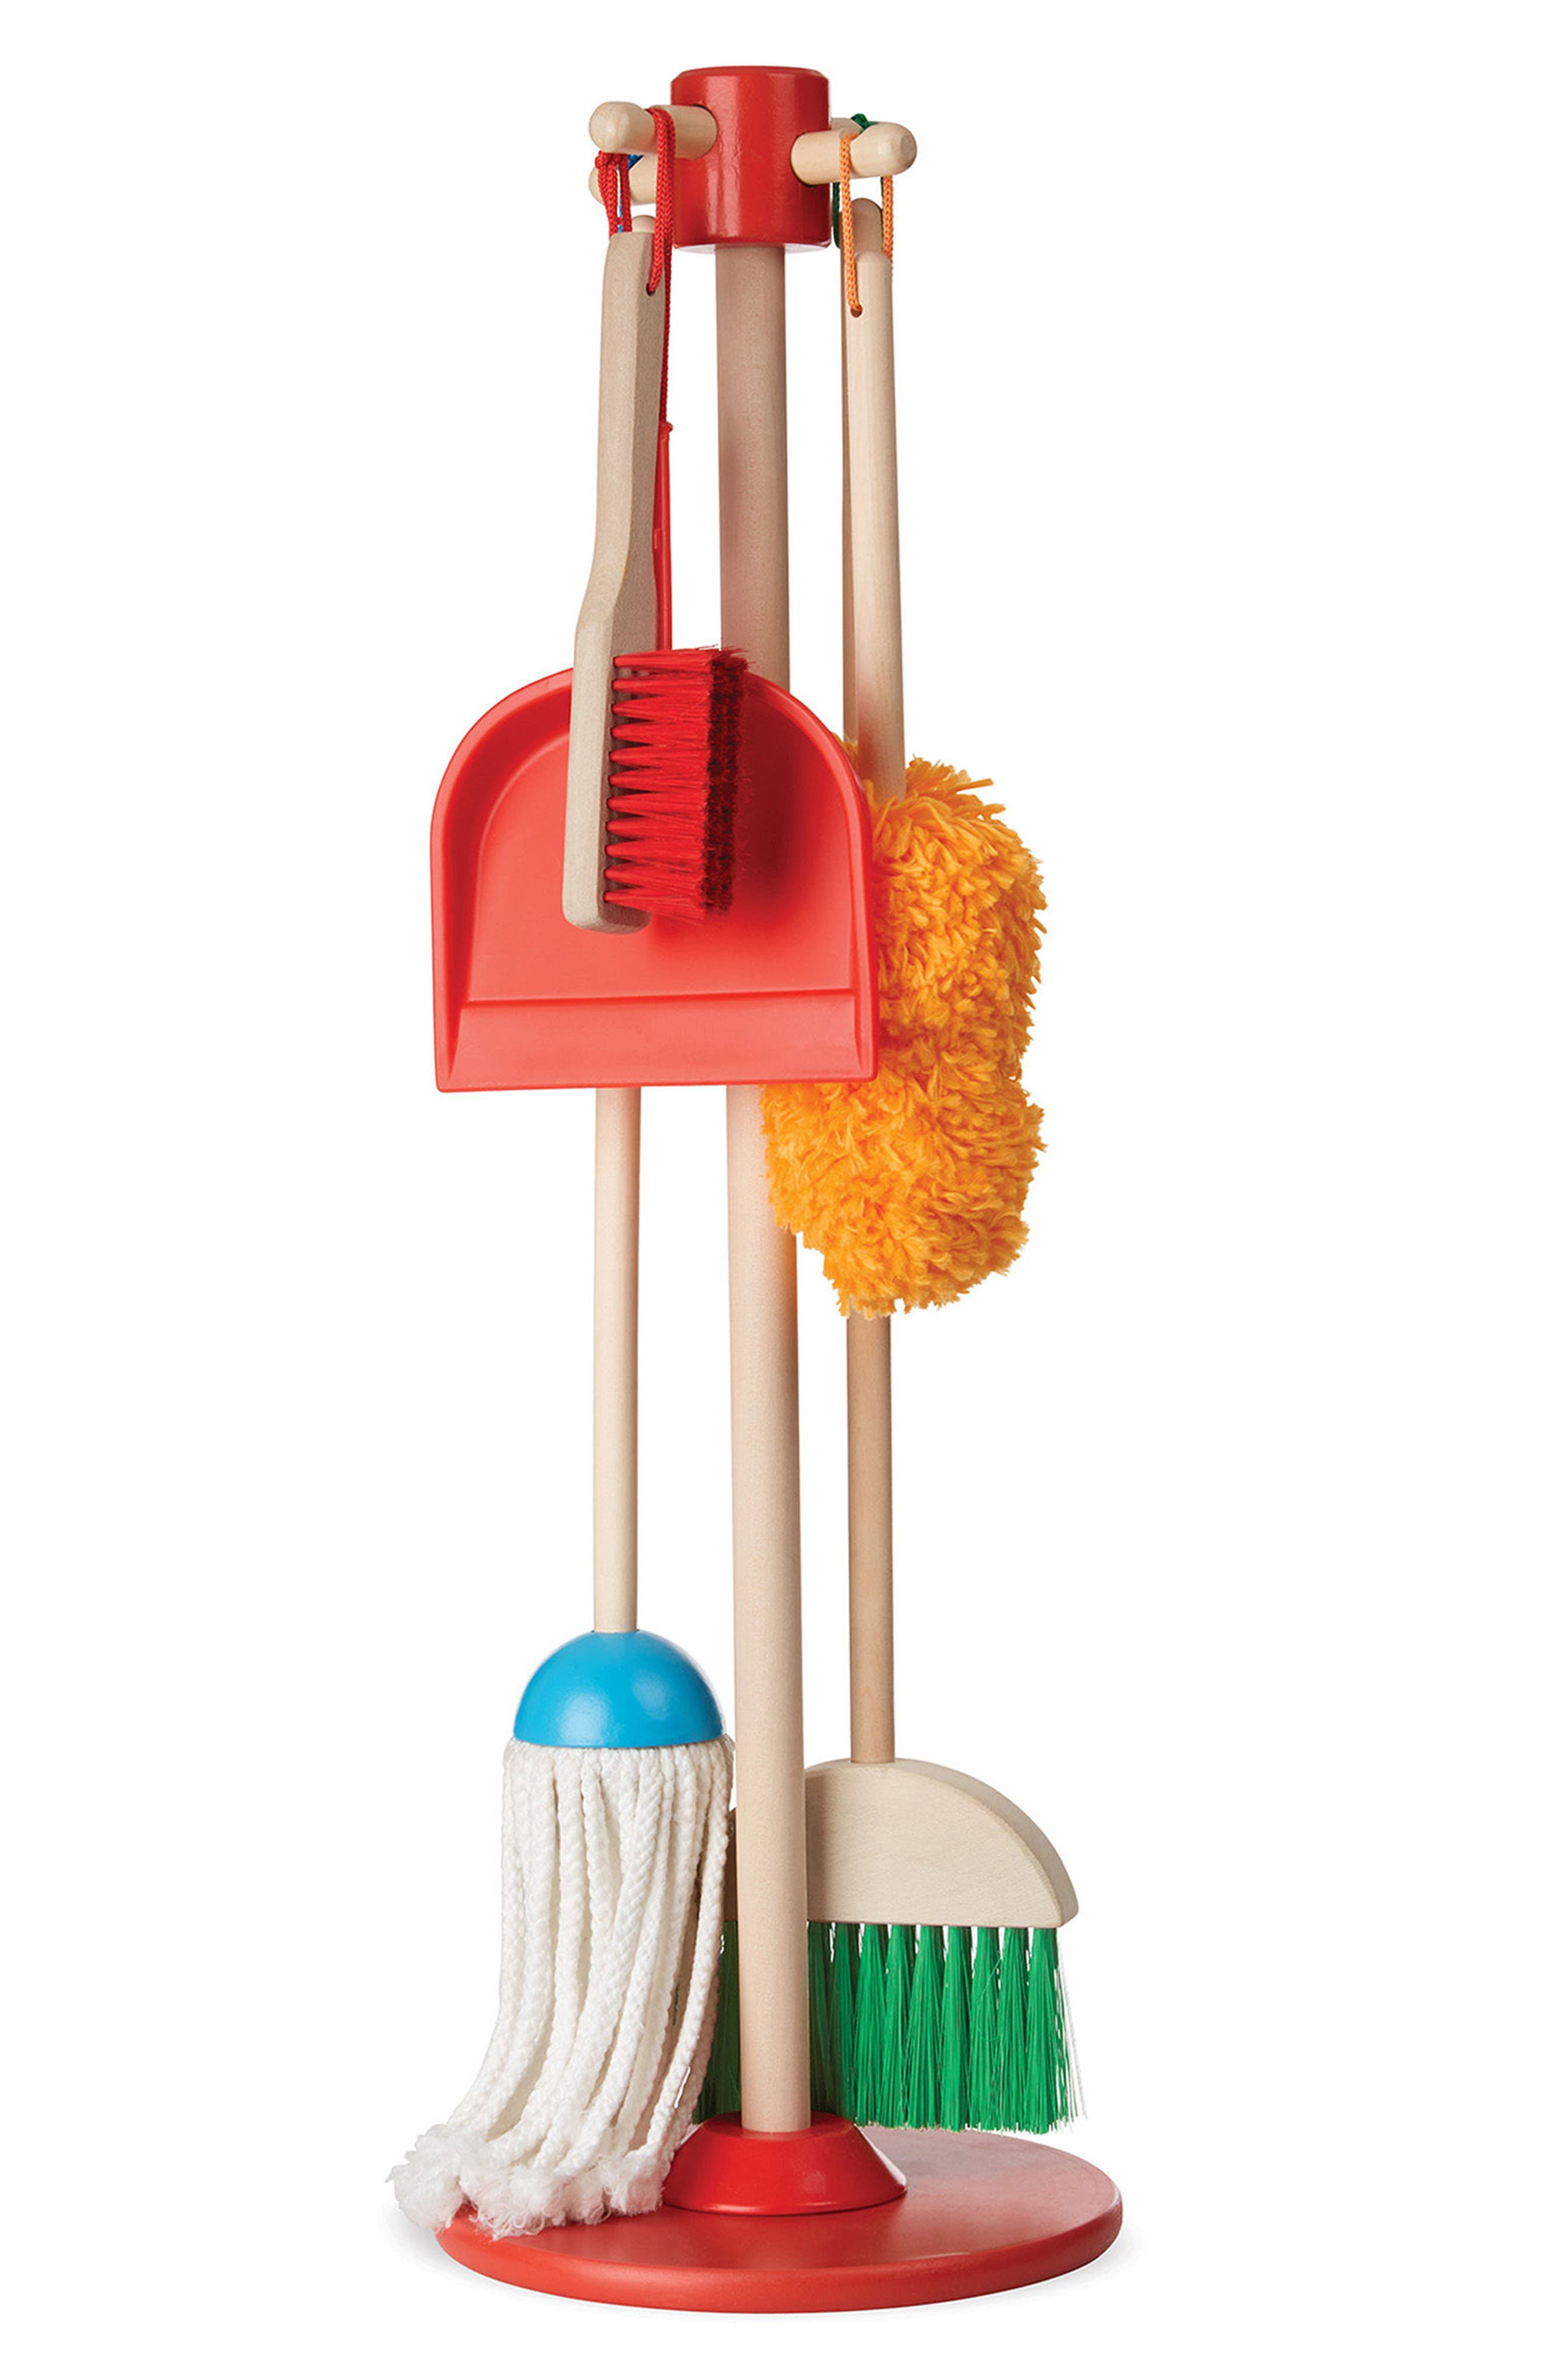 Dust, Sweep & Mop Toy Set,                             Alternate thumbnail 2, color,                             No Color